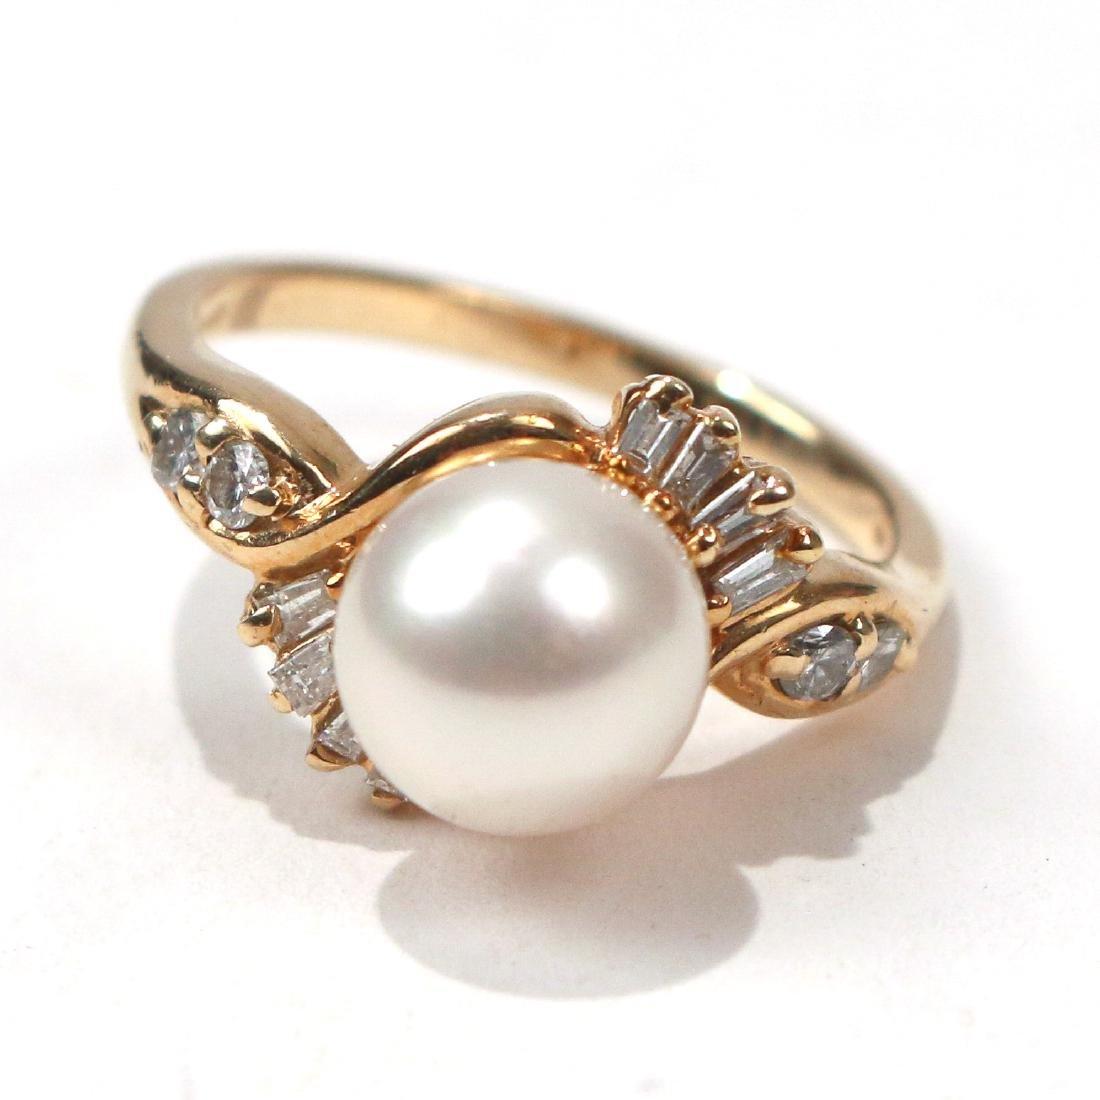 MAUI DIVER'S PEARL & DIAMOND RING